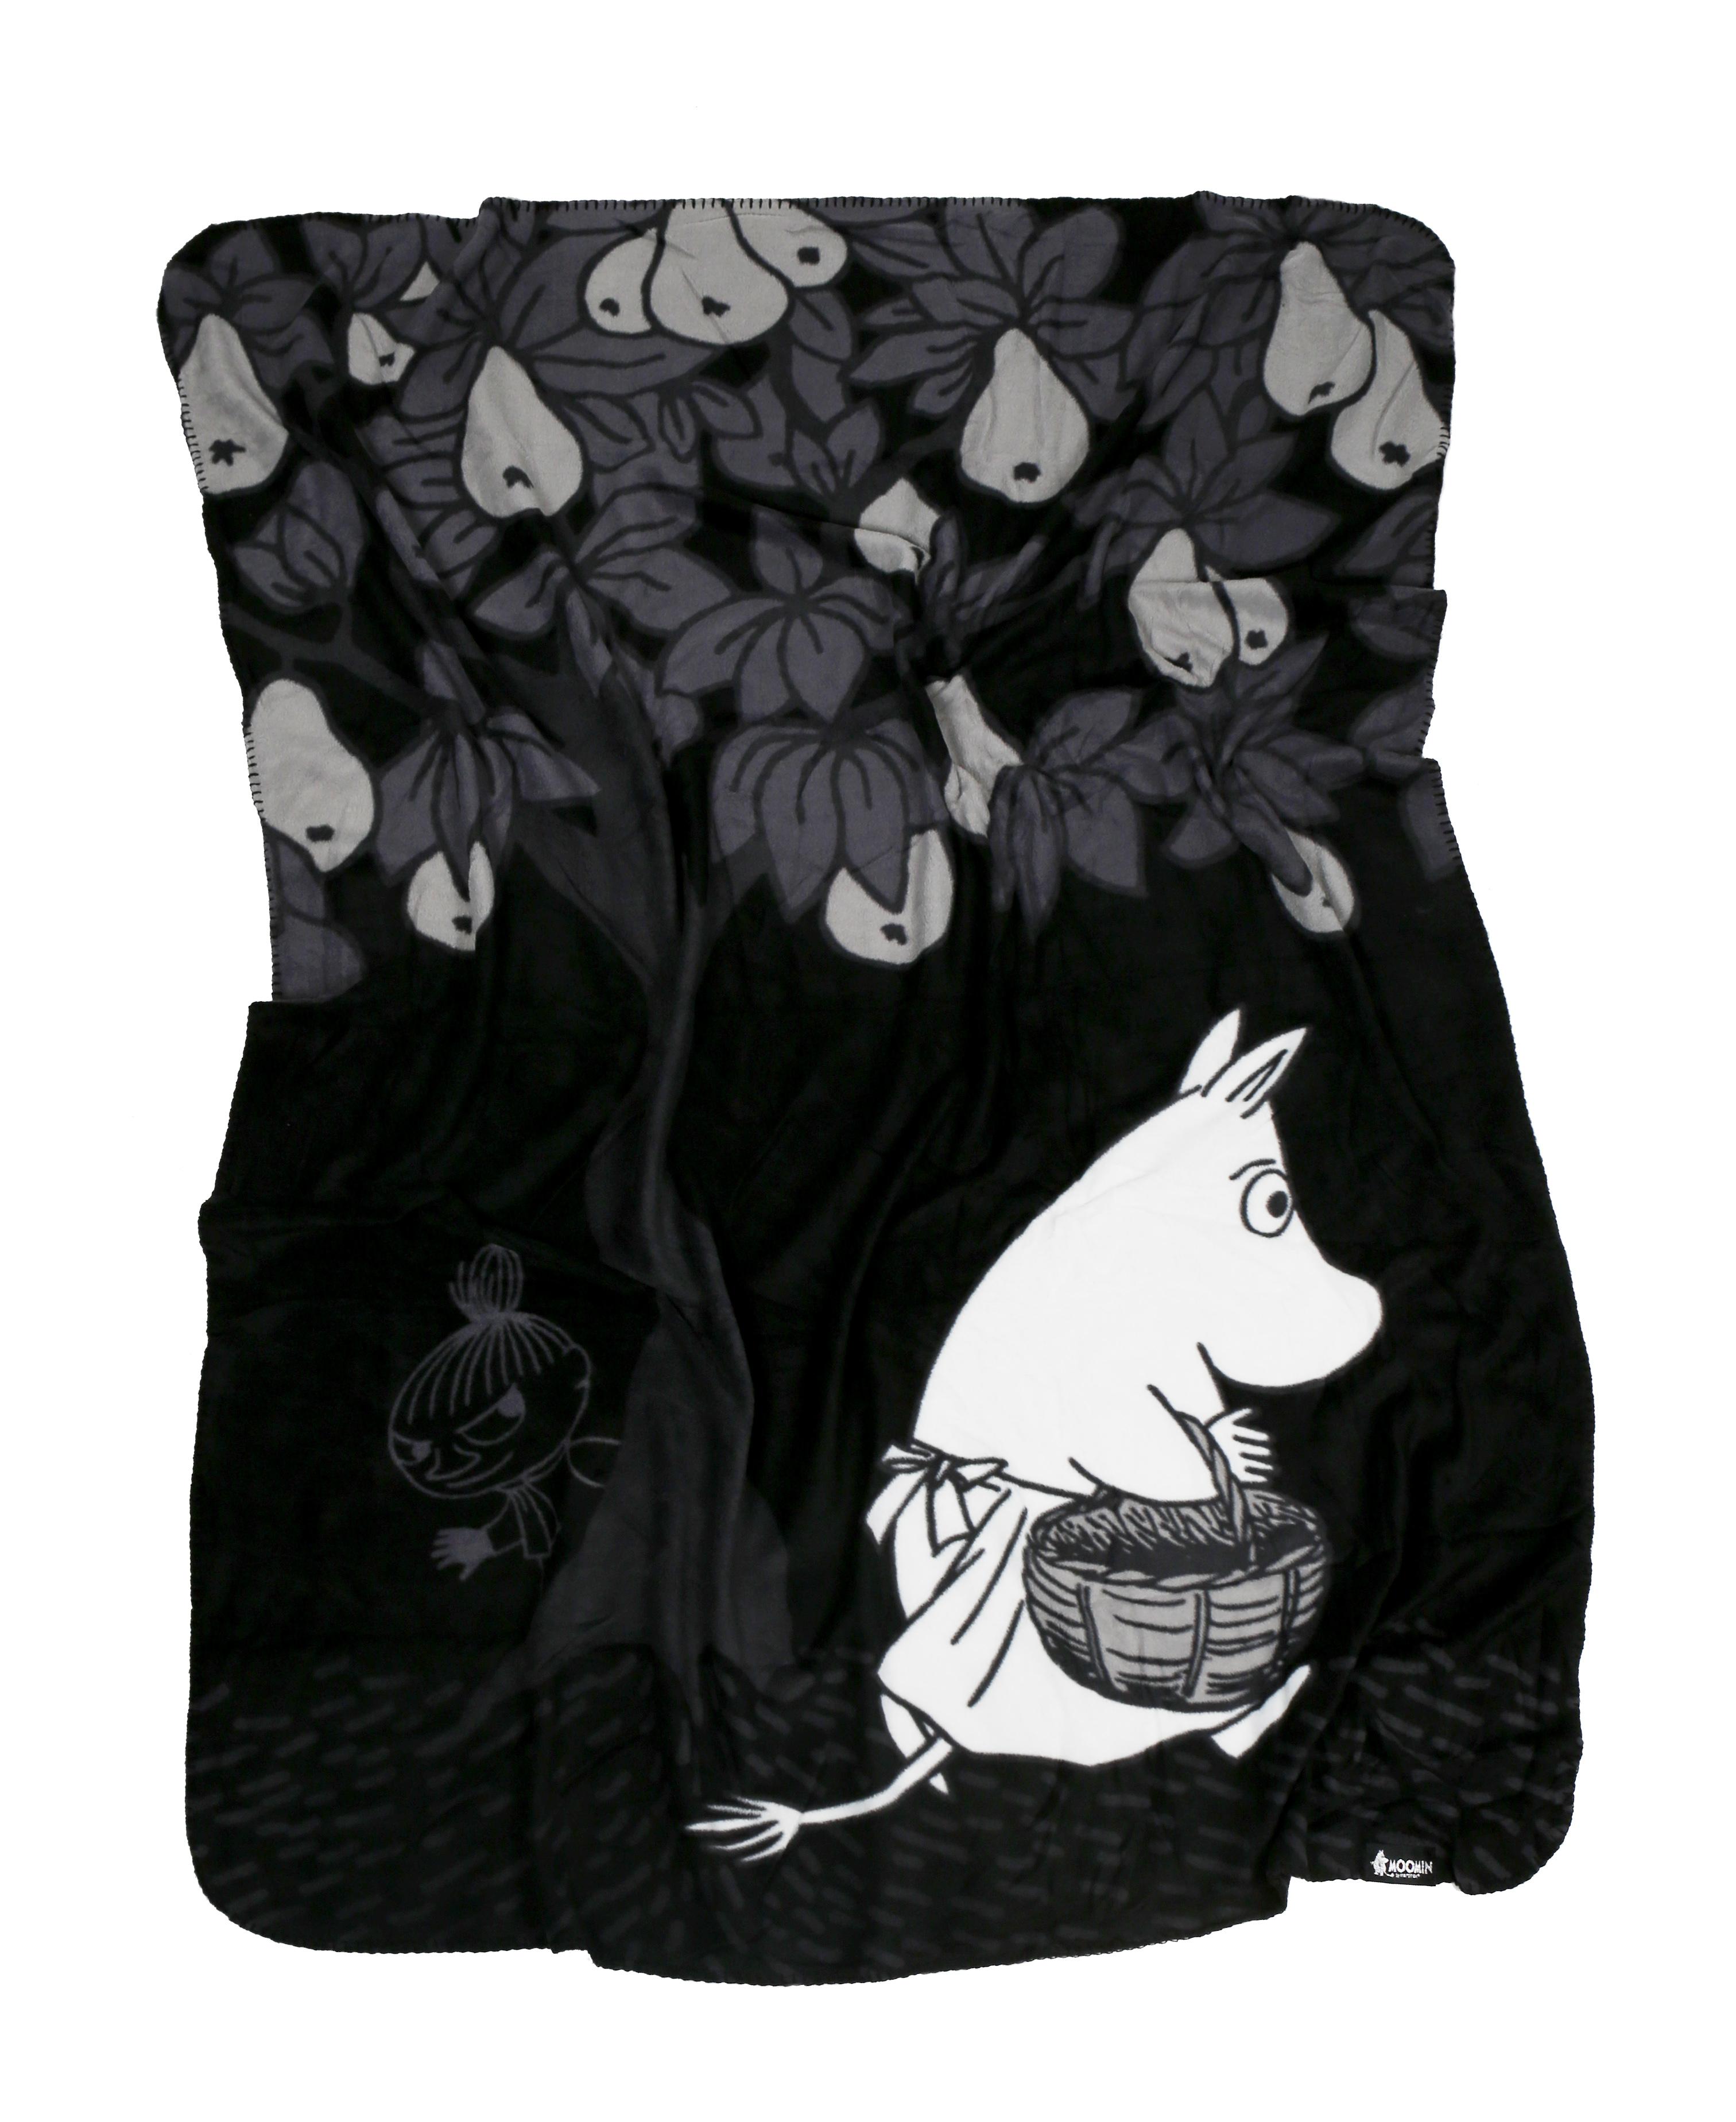 Martinex Moominmamas Pear Tree Blanket